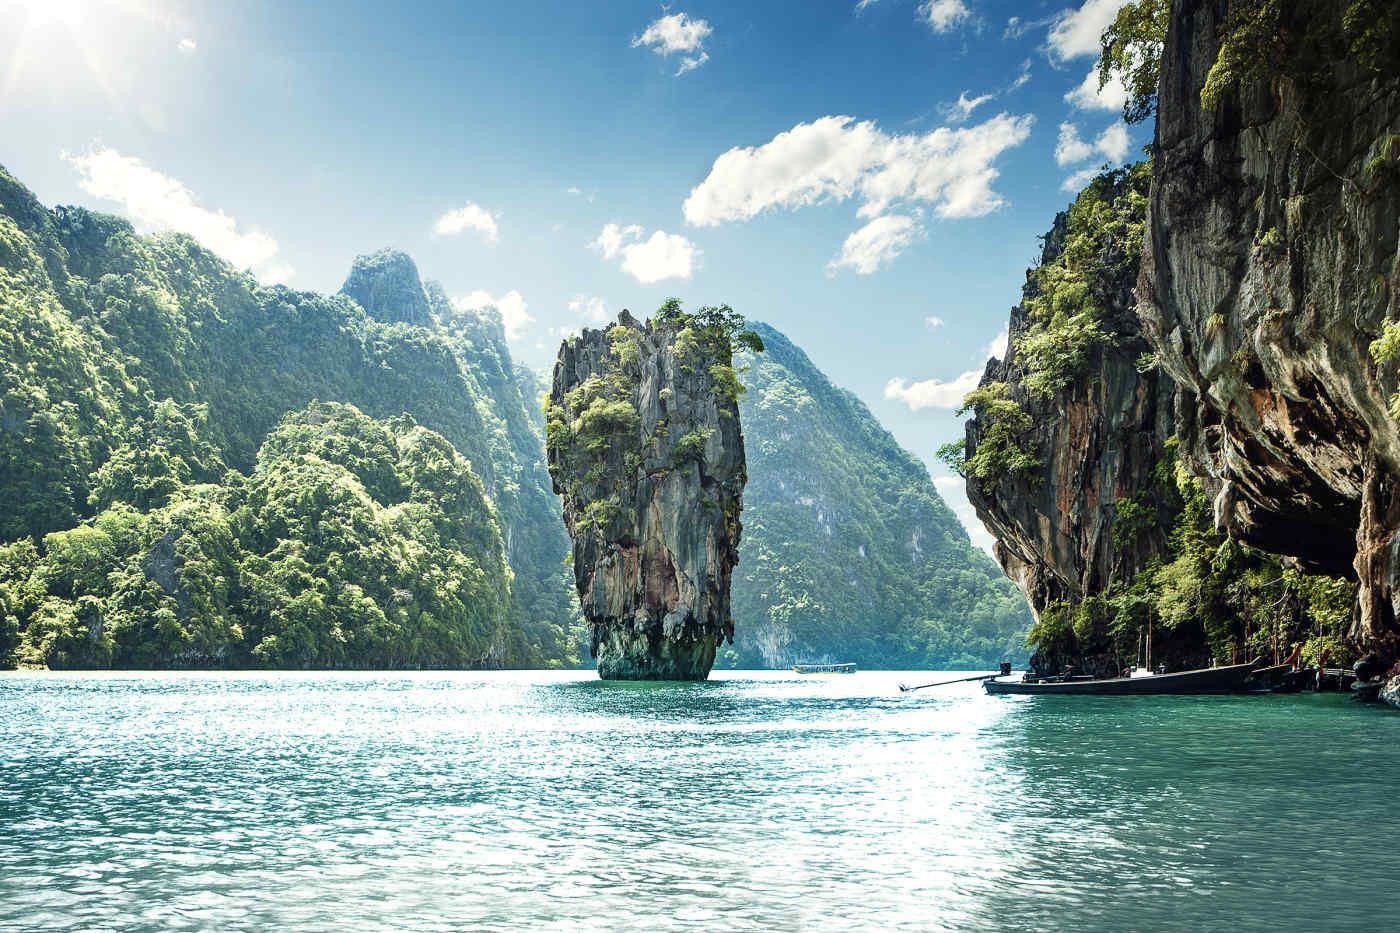 James Bond Island, Phuket